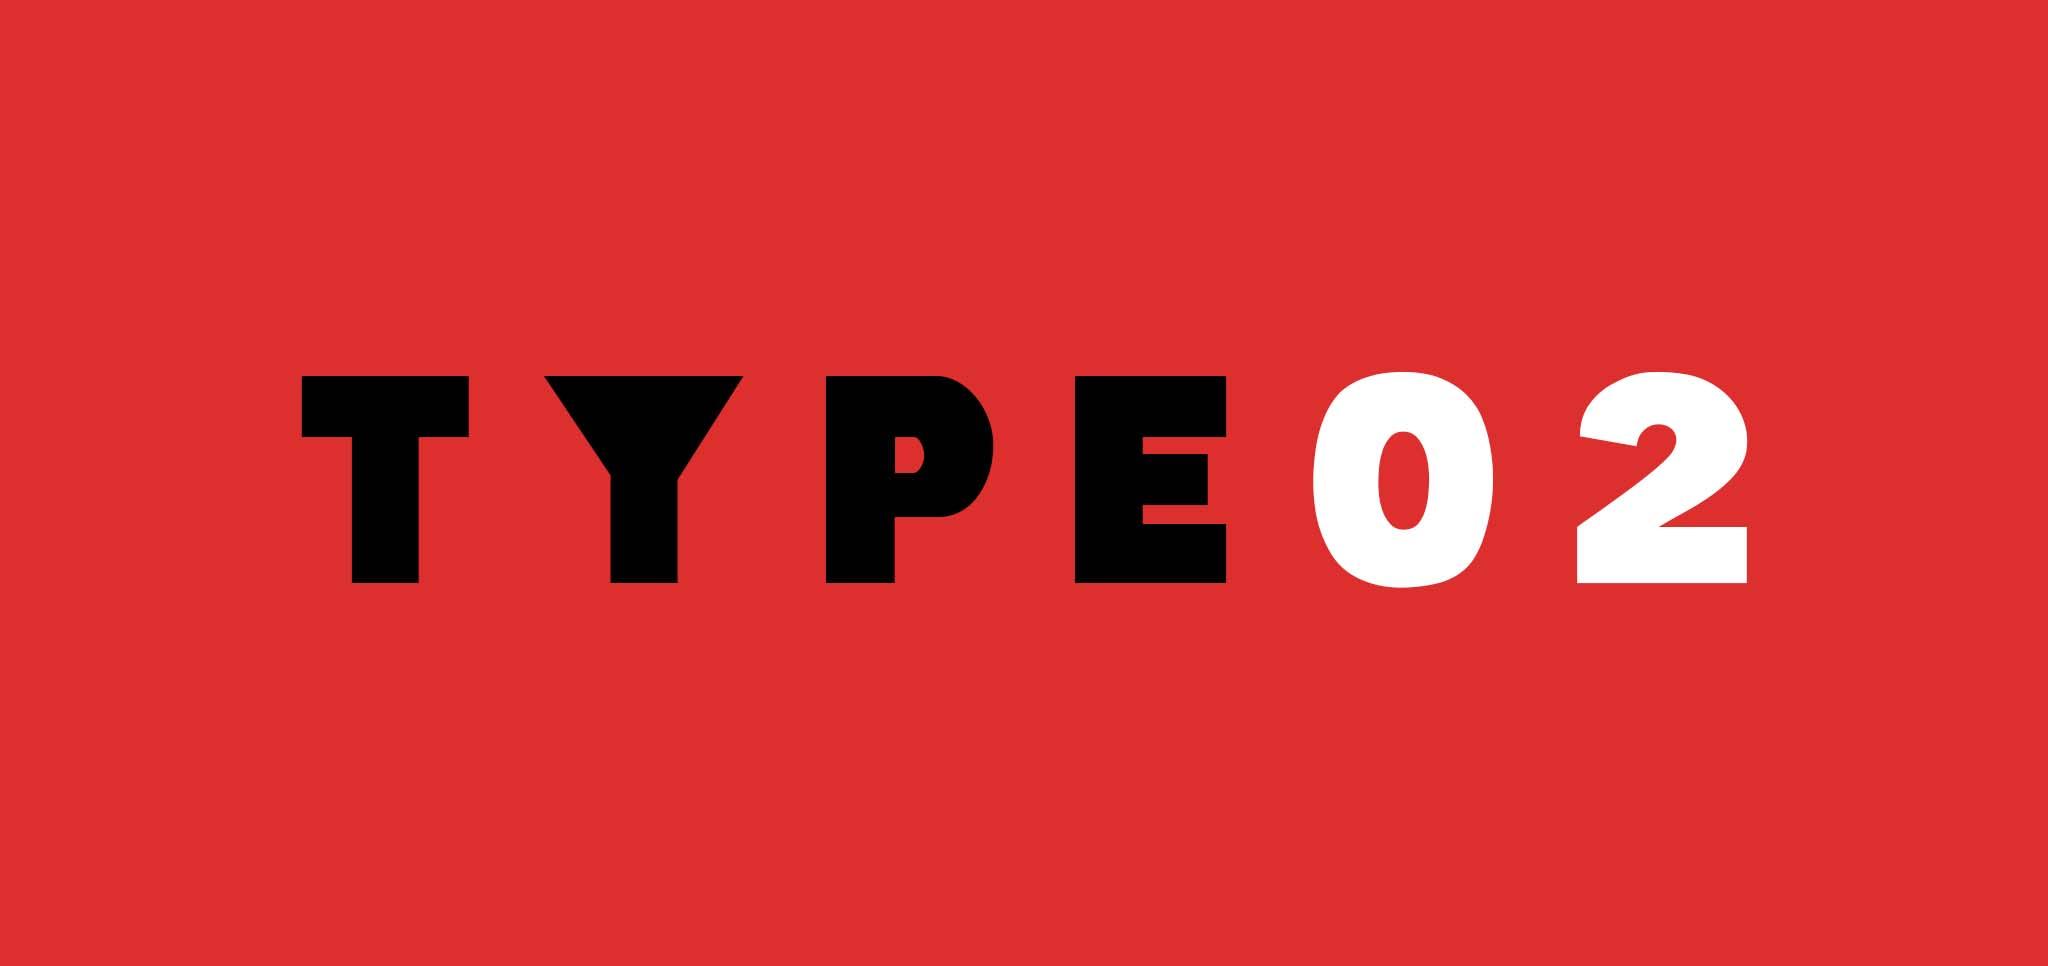 21 gratis stoere lettertypes - Type02